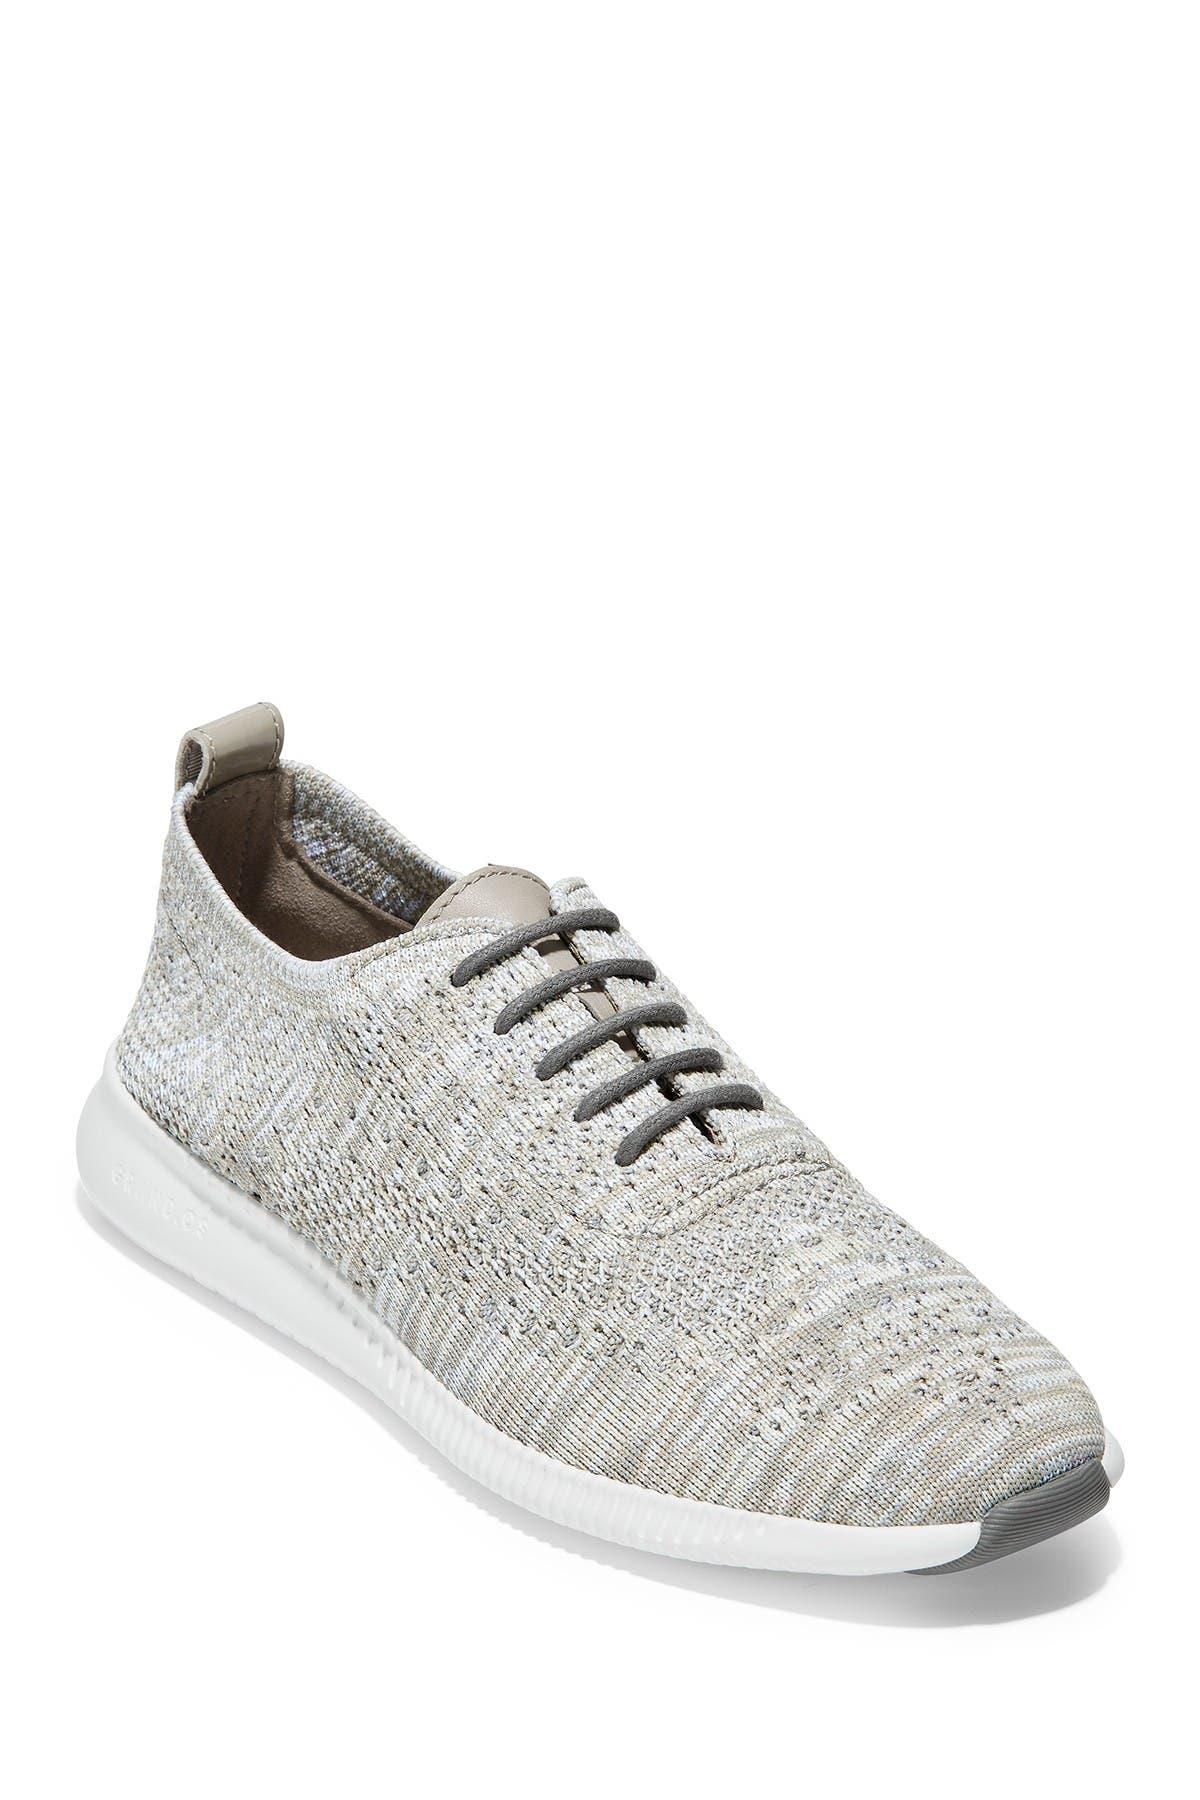 Cole Haan | ZeroGrand Knit Sneaker